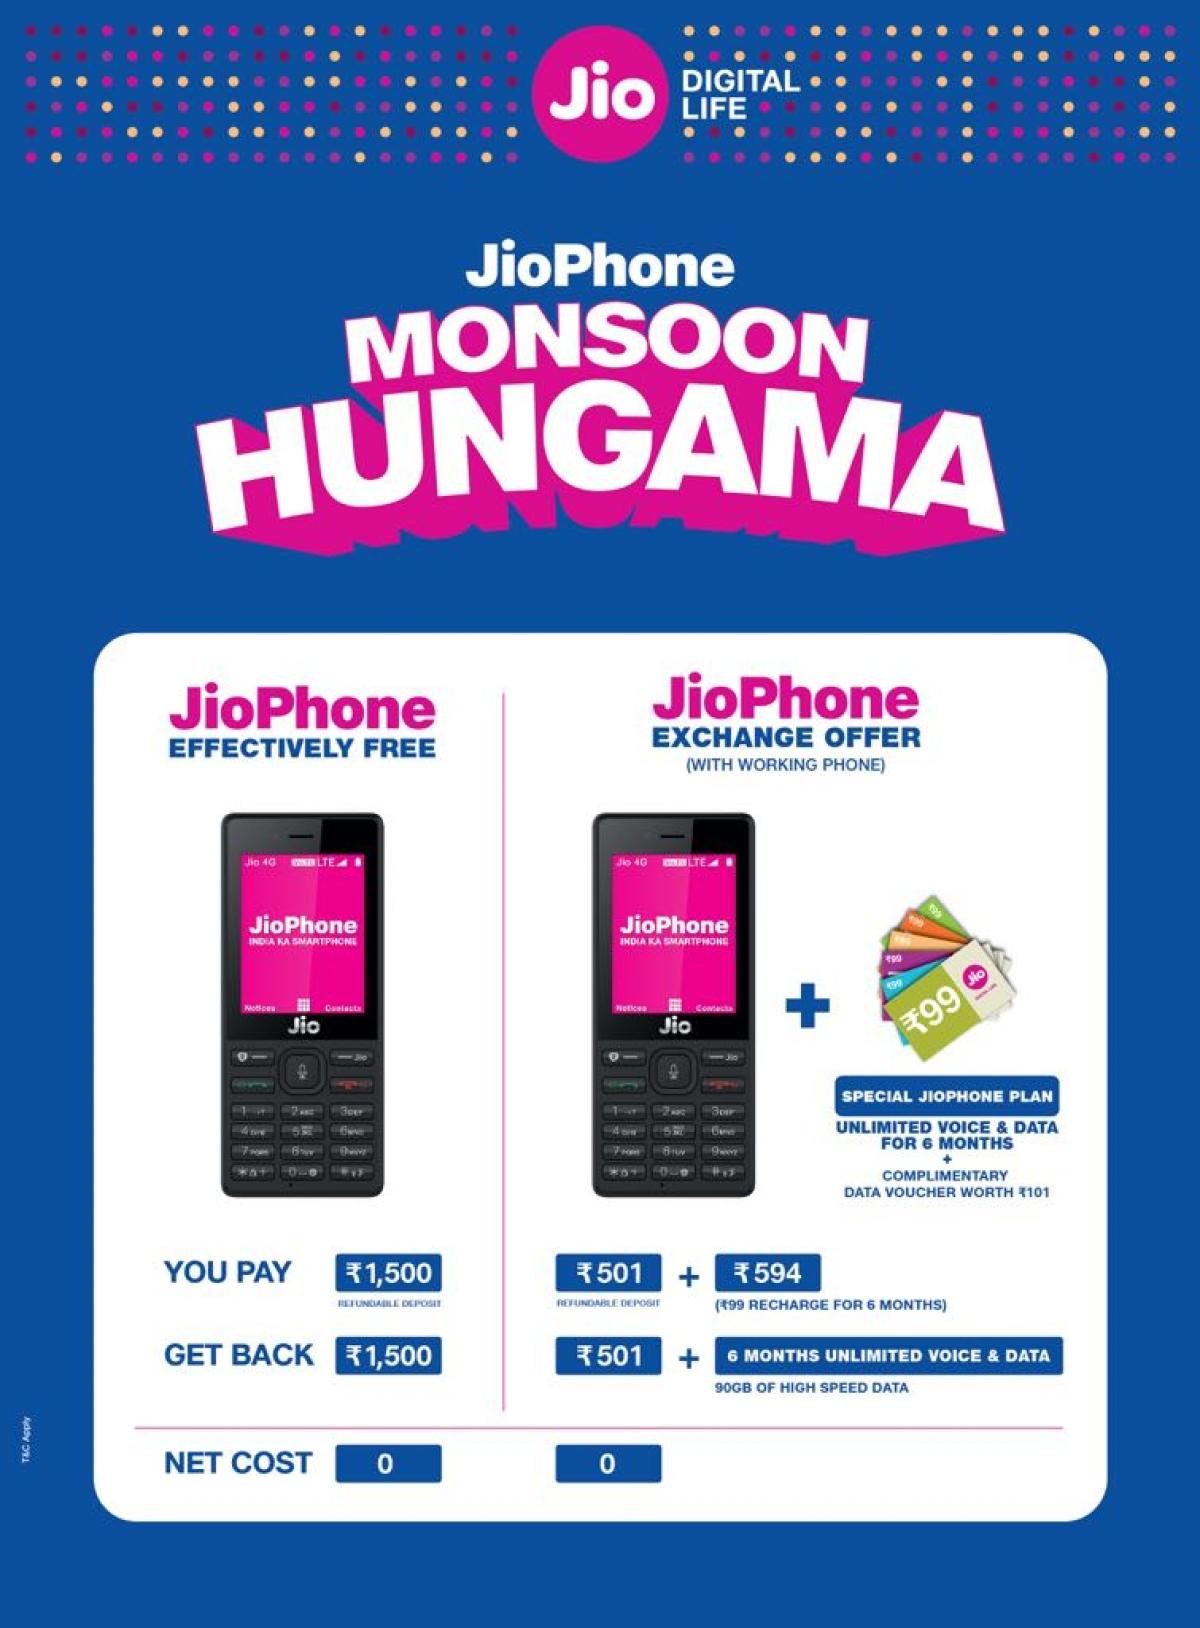 Reliance Jio Monsoon HUngama Offer: Reliance Jio Launches